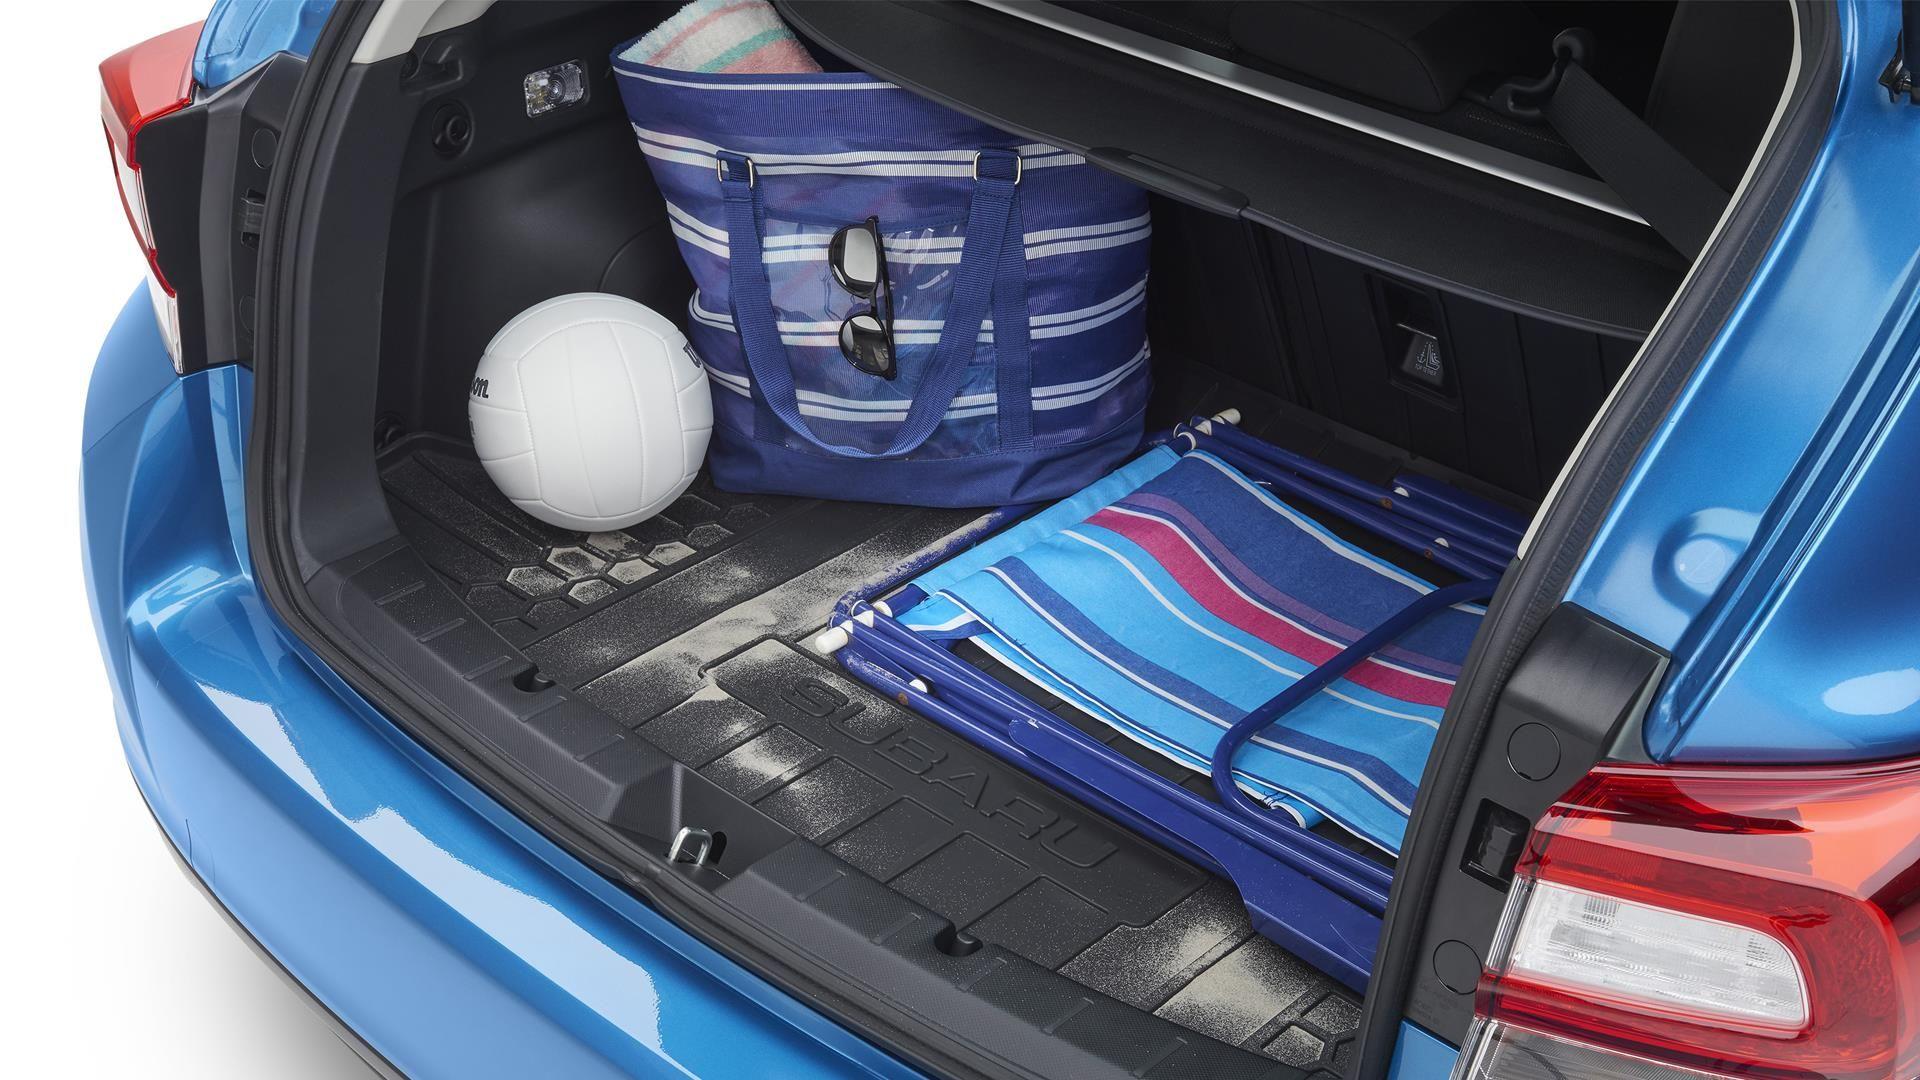 5 Door J501sfl301 Genuine Subaru Accessory Subaru Accessories Subaru Subaru Crosstrek